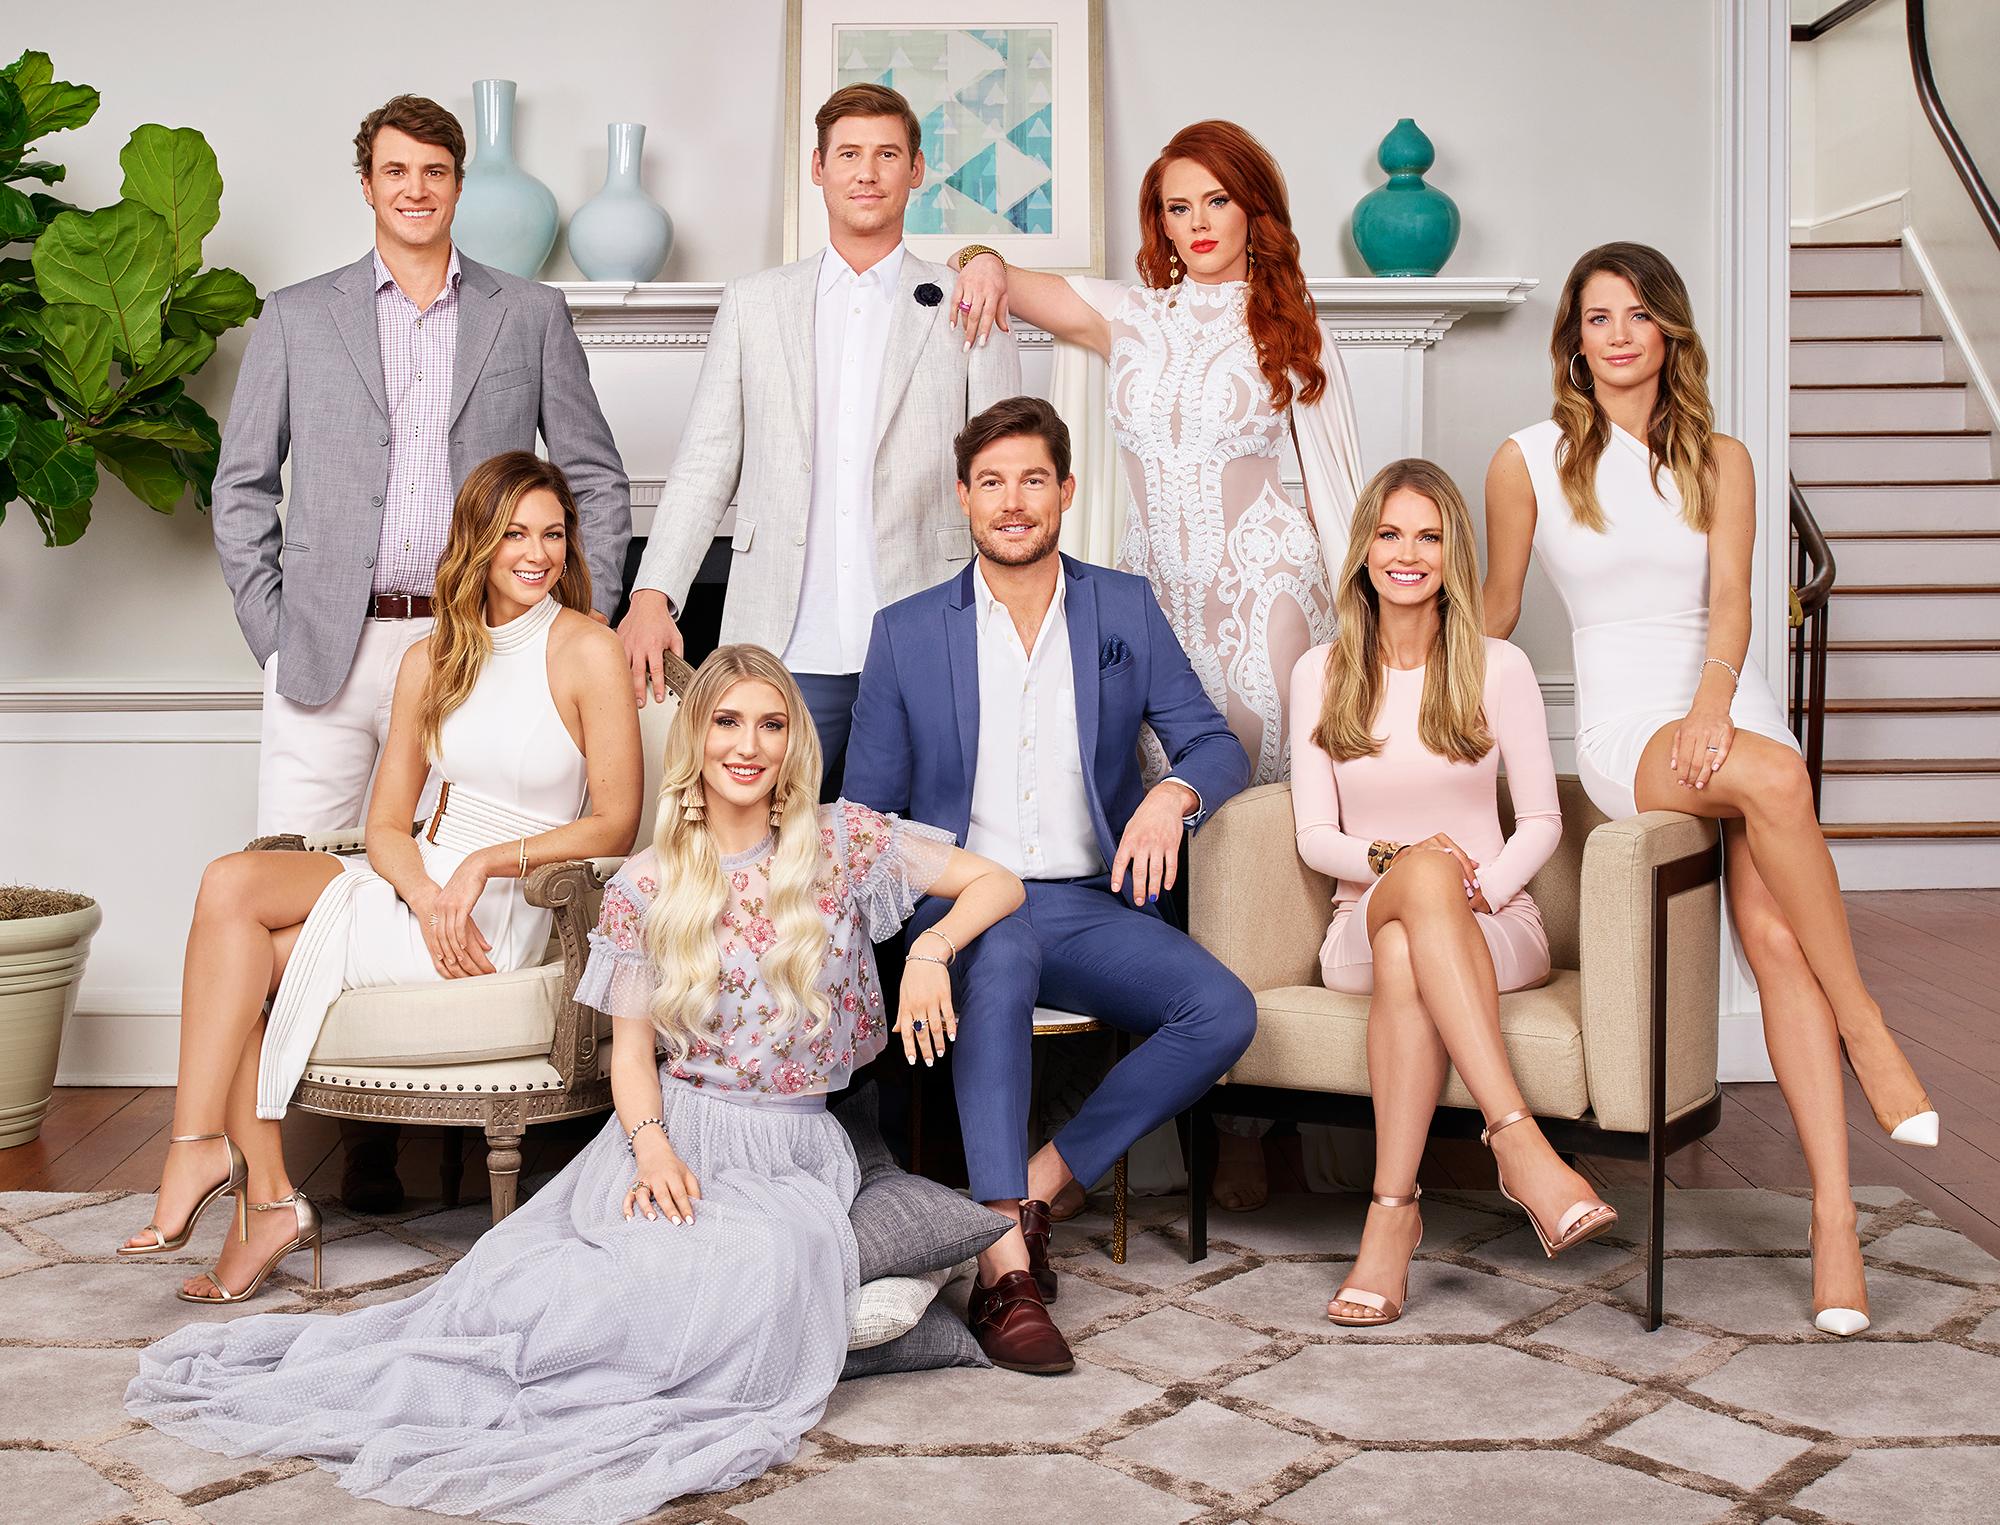 Southern-Charm-Season-7-Filming-After-Long-Hiatus